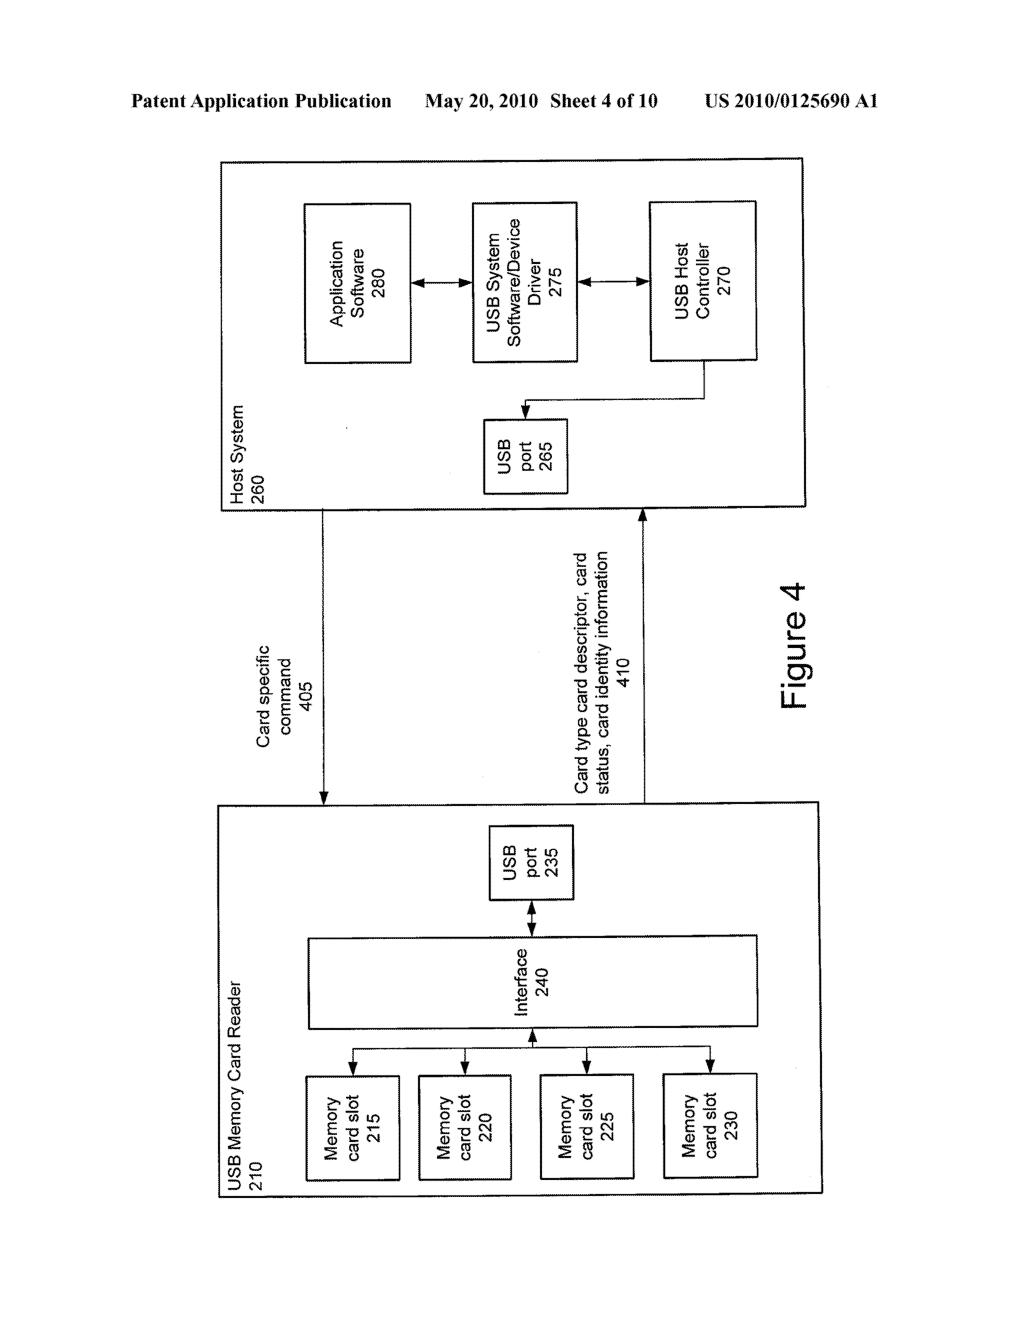 Usb Card Diagram Wiring Master Blogs Soundcard Circuit With Pcm2702 Schematic Electronics Memory Reader Having Identification Rh Patentsencyclopedia Com Sound Block